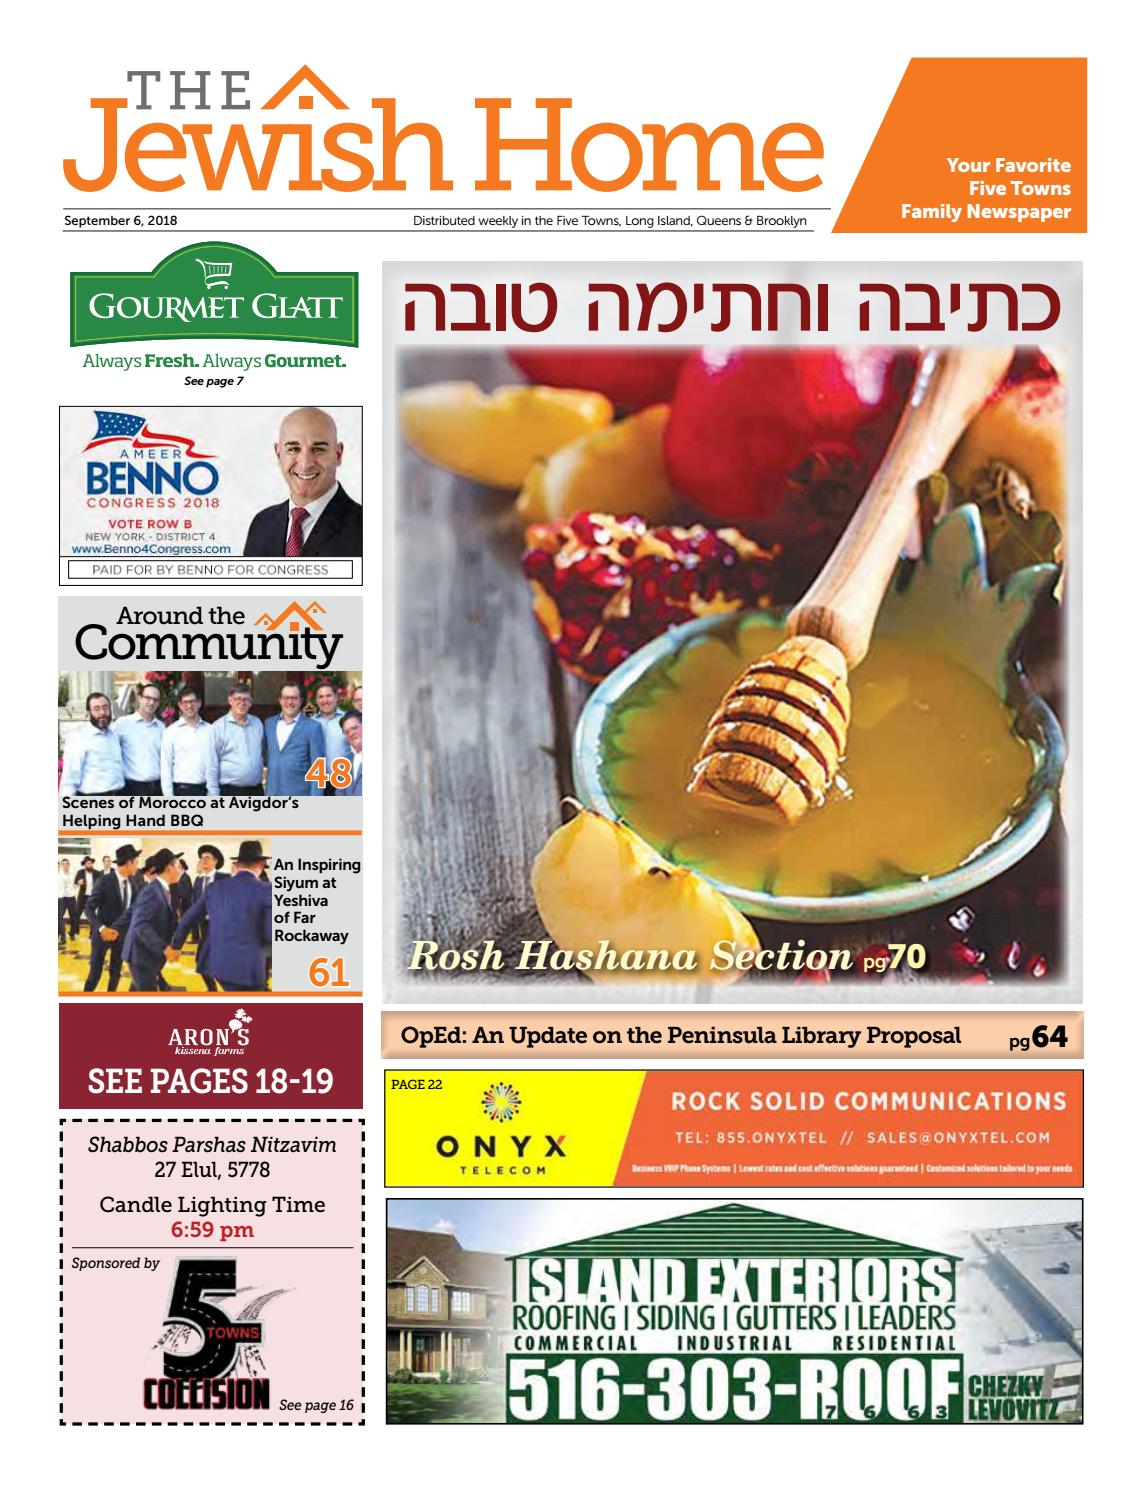 3866412a8350 Five Towns Jewish Home - 9-6-18 by Yitzy Halpern - issuu